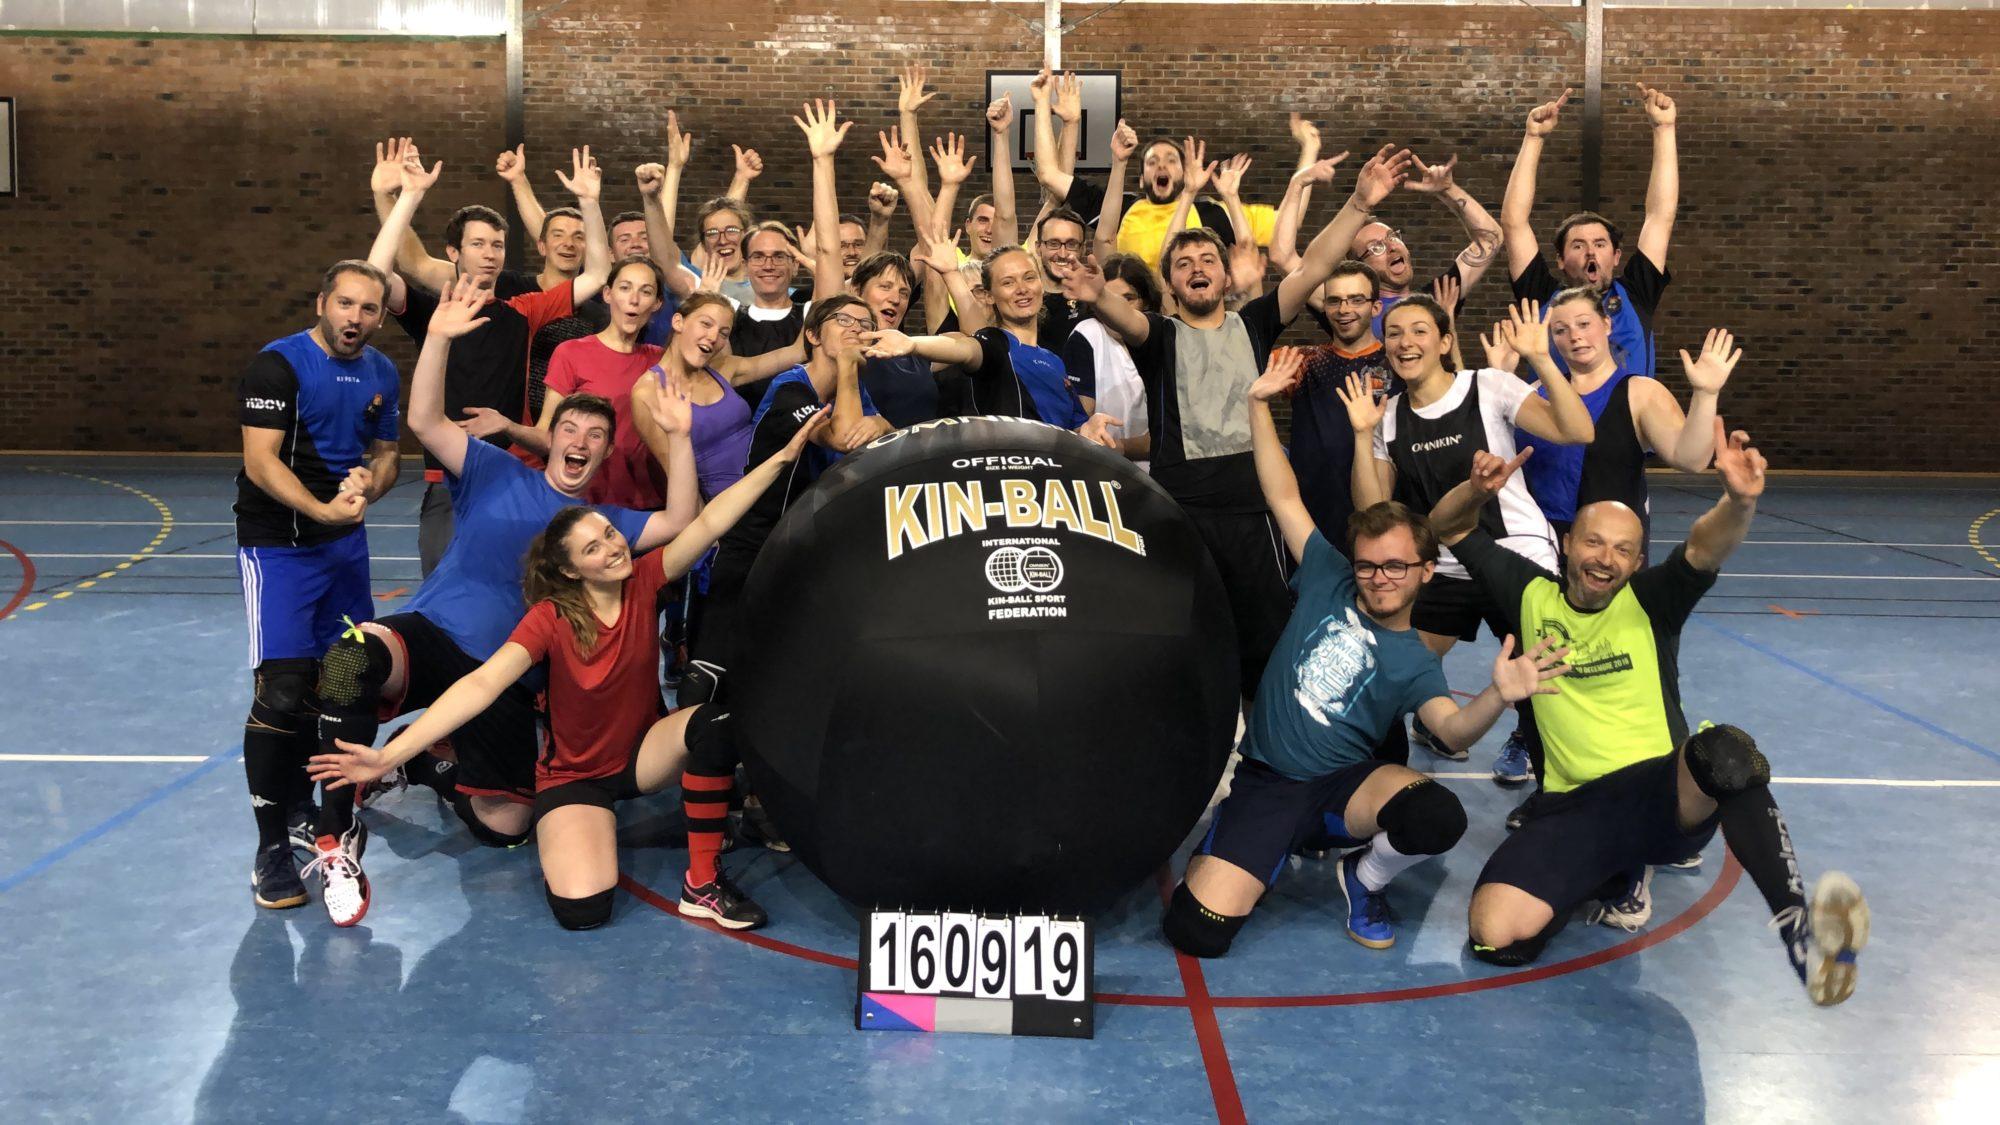 Kinball Club Villeneuvois